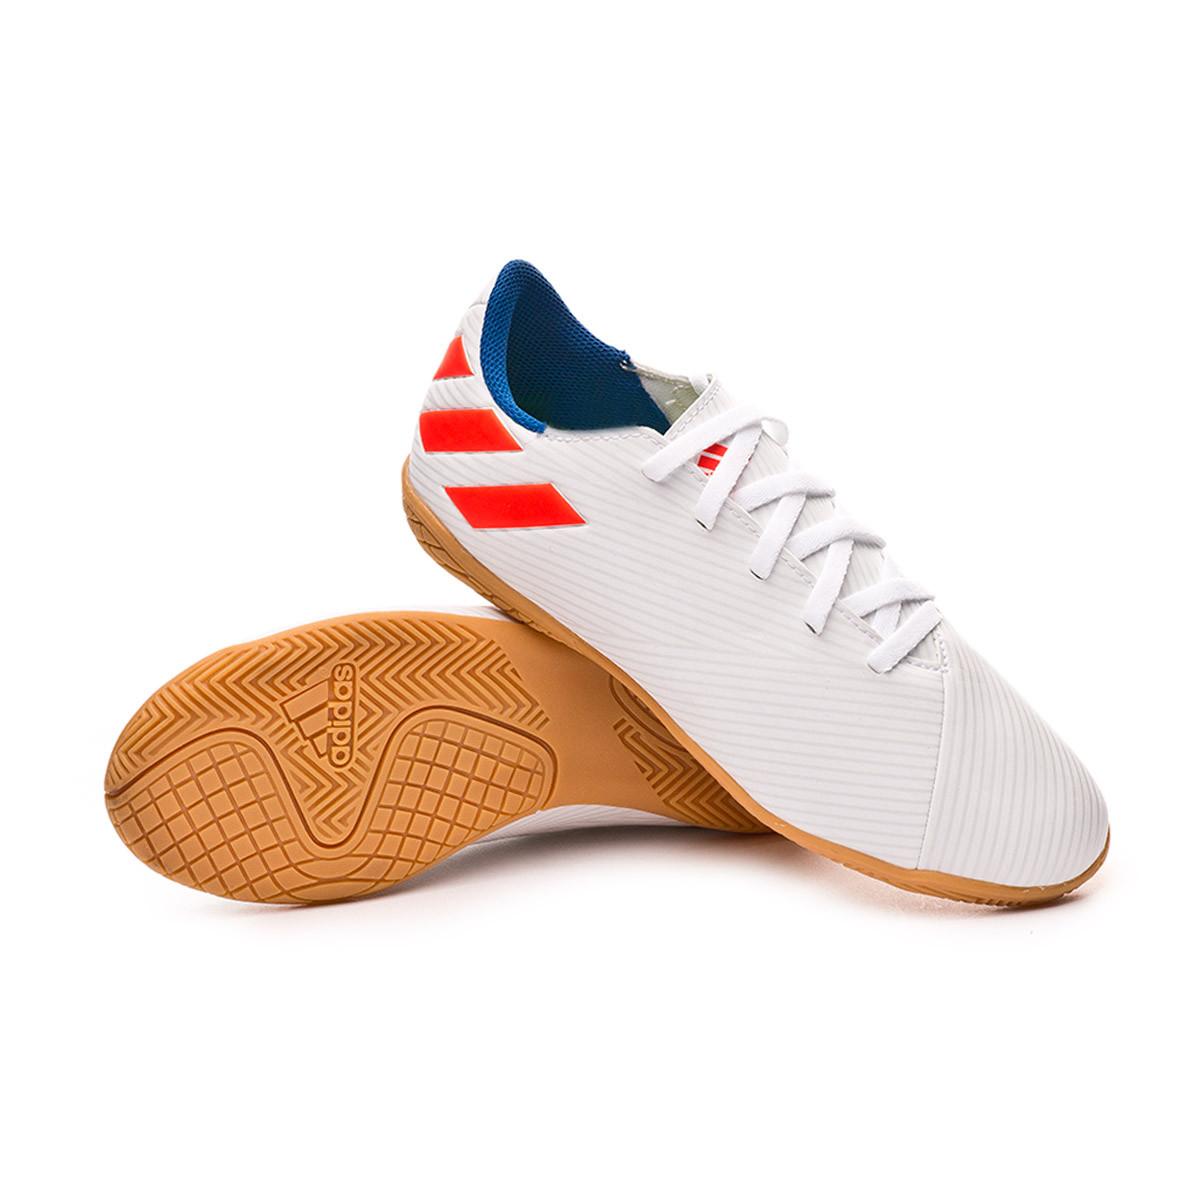 chaussures futsal enfant adidas